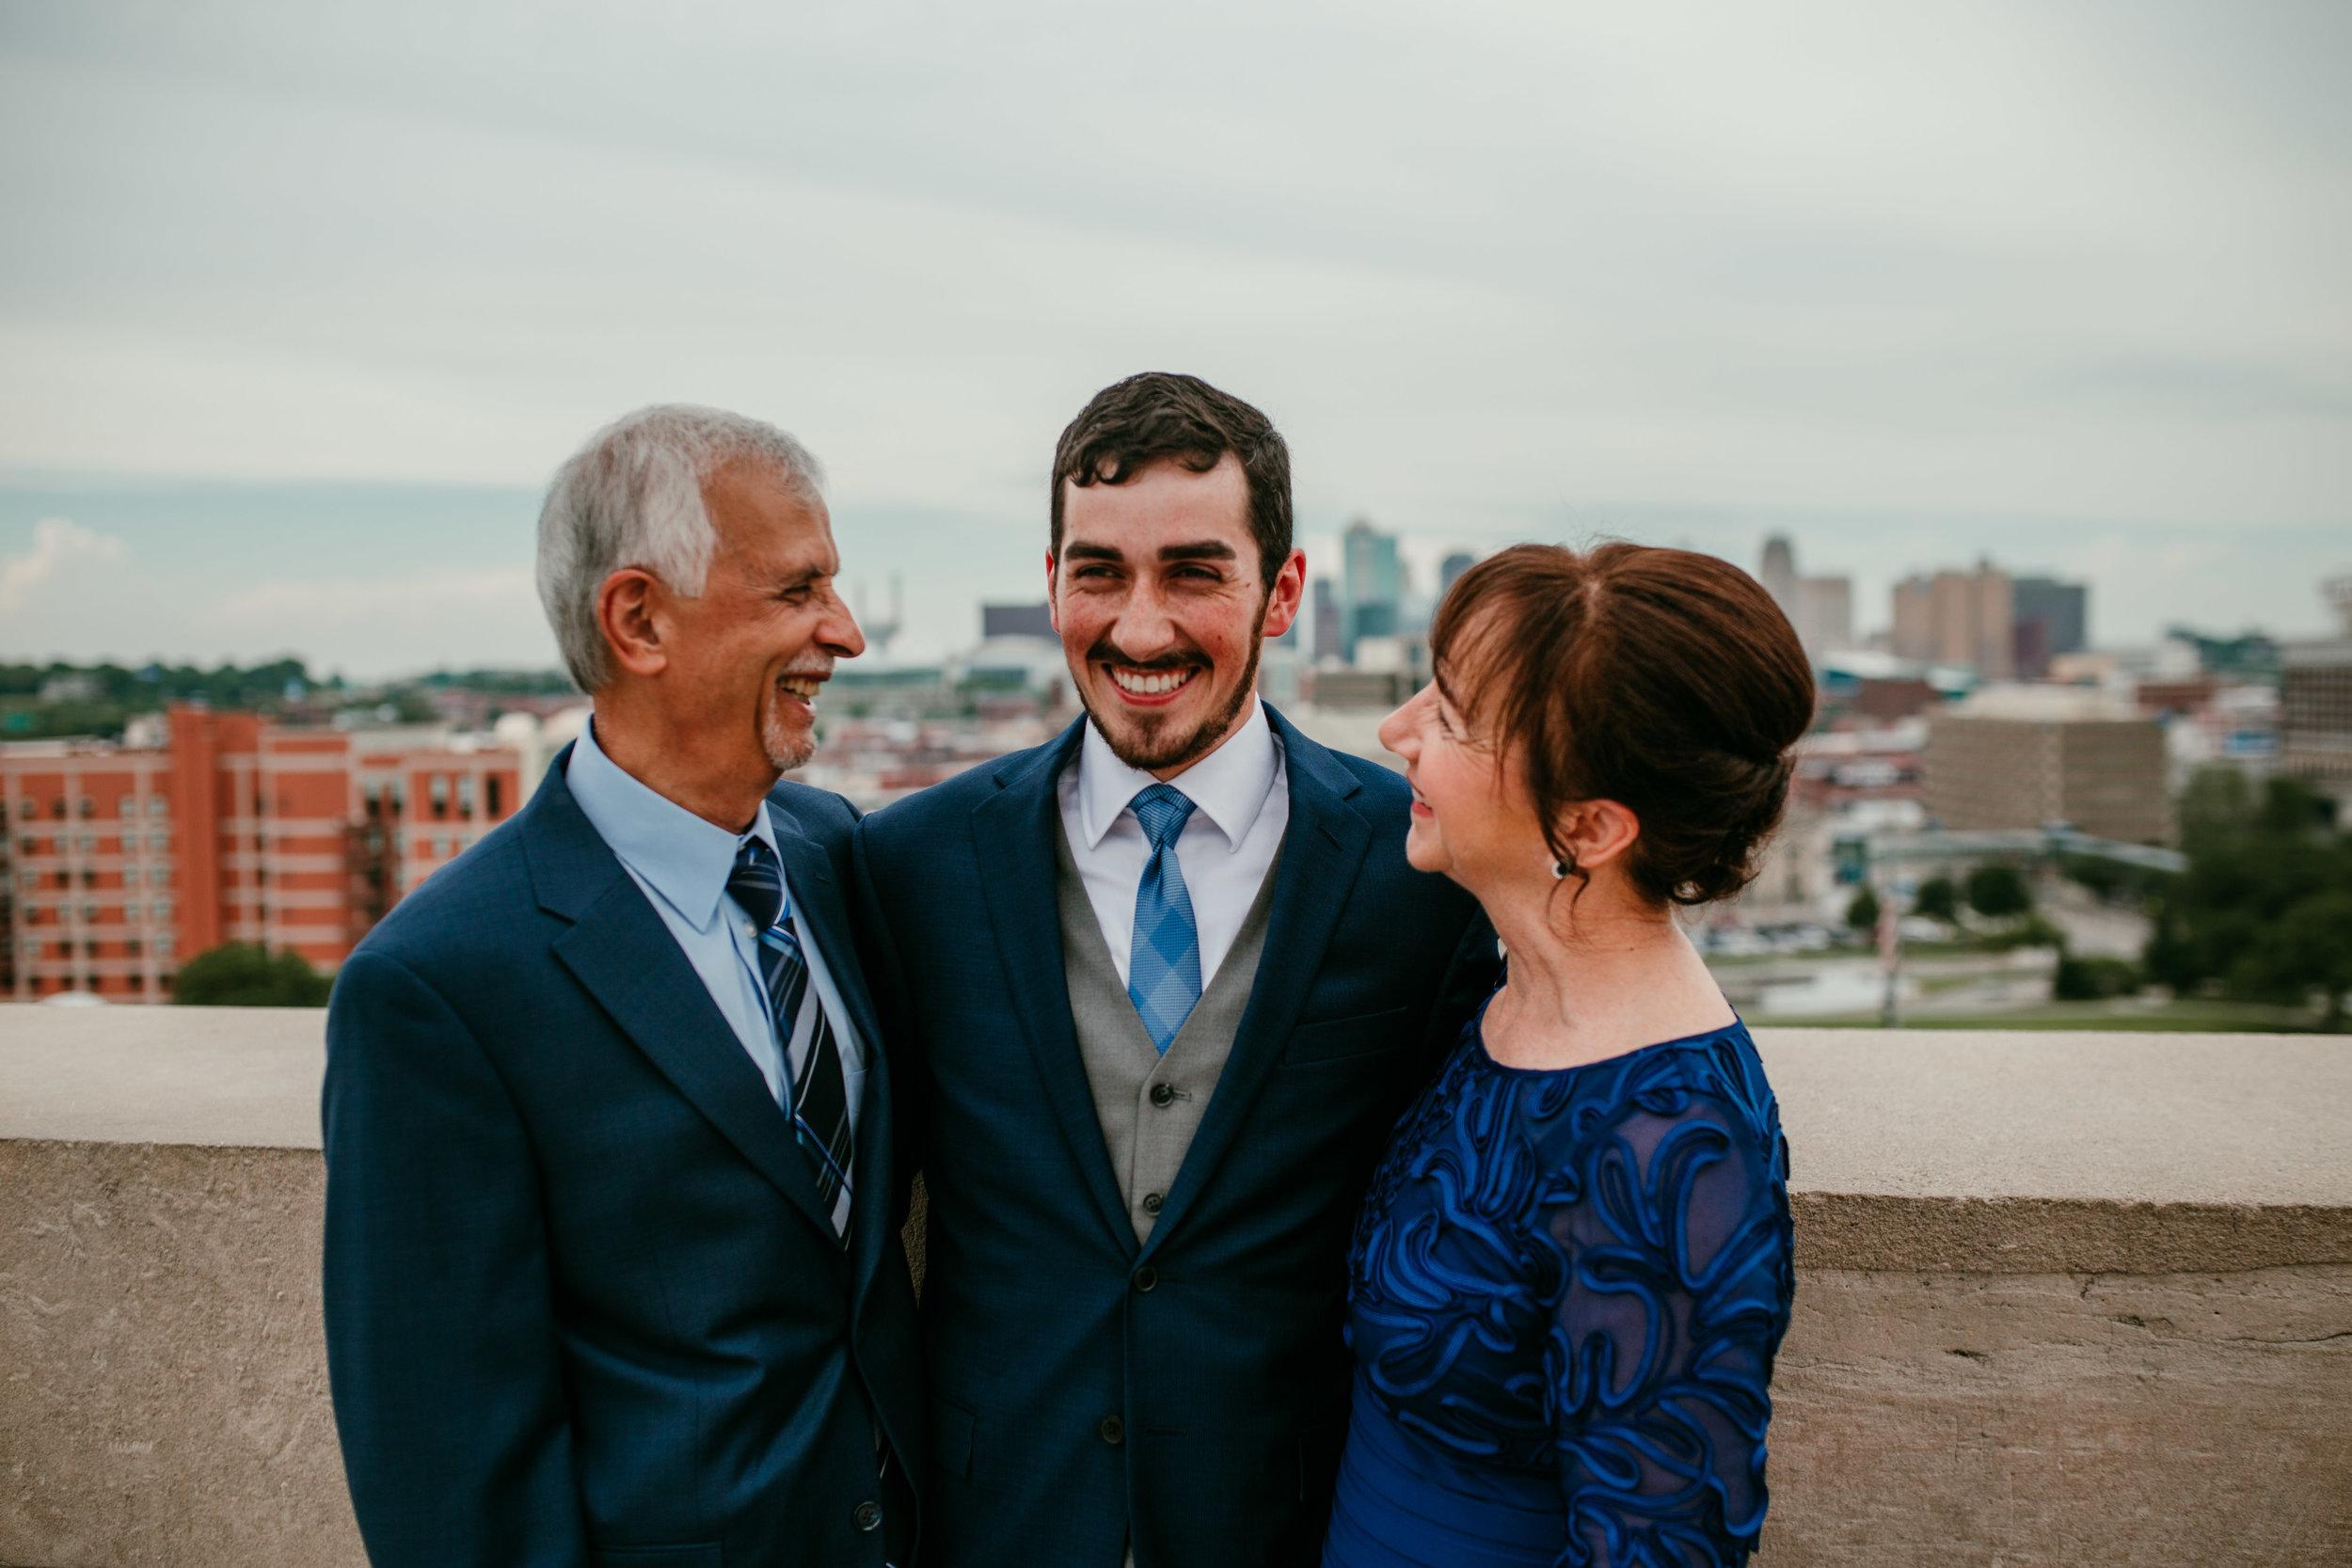 Family portraits at Liberty Memorial Skyline Downtown Kansas City   Shelbie & Jospeh's Summer Love Story : Kansas City Wedding   Hanna Hill Photography